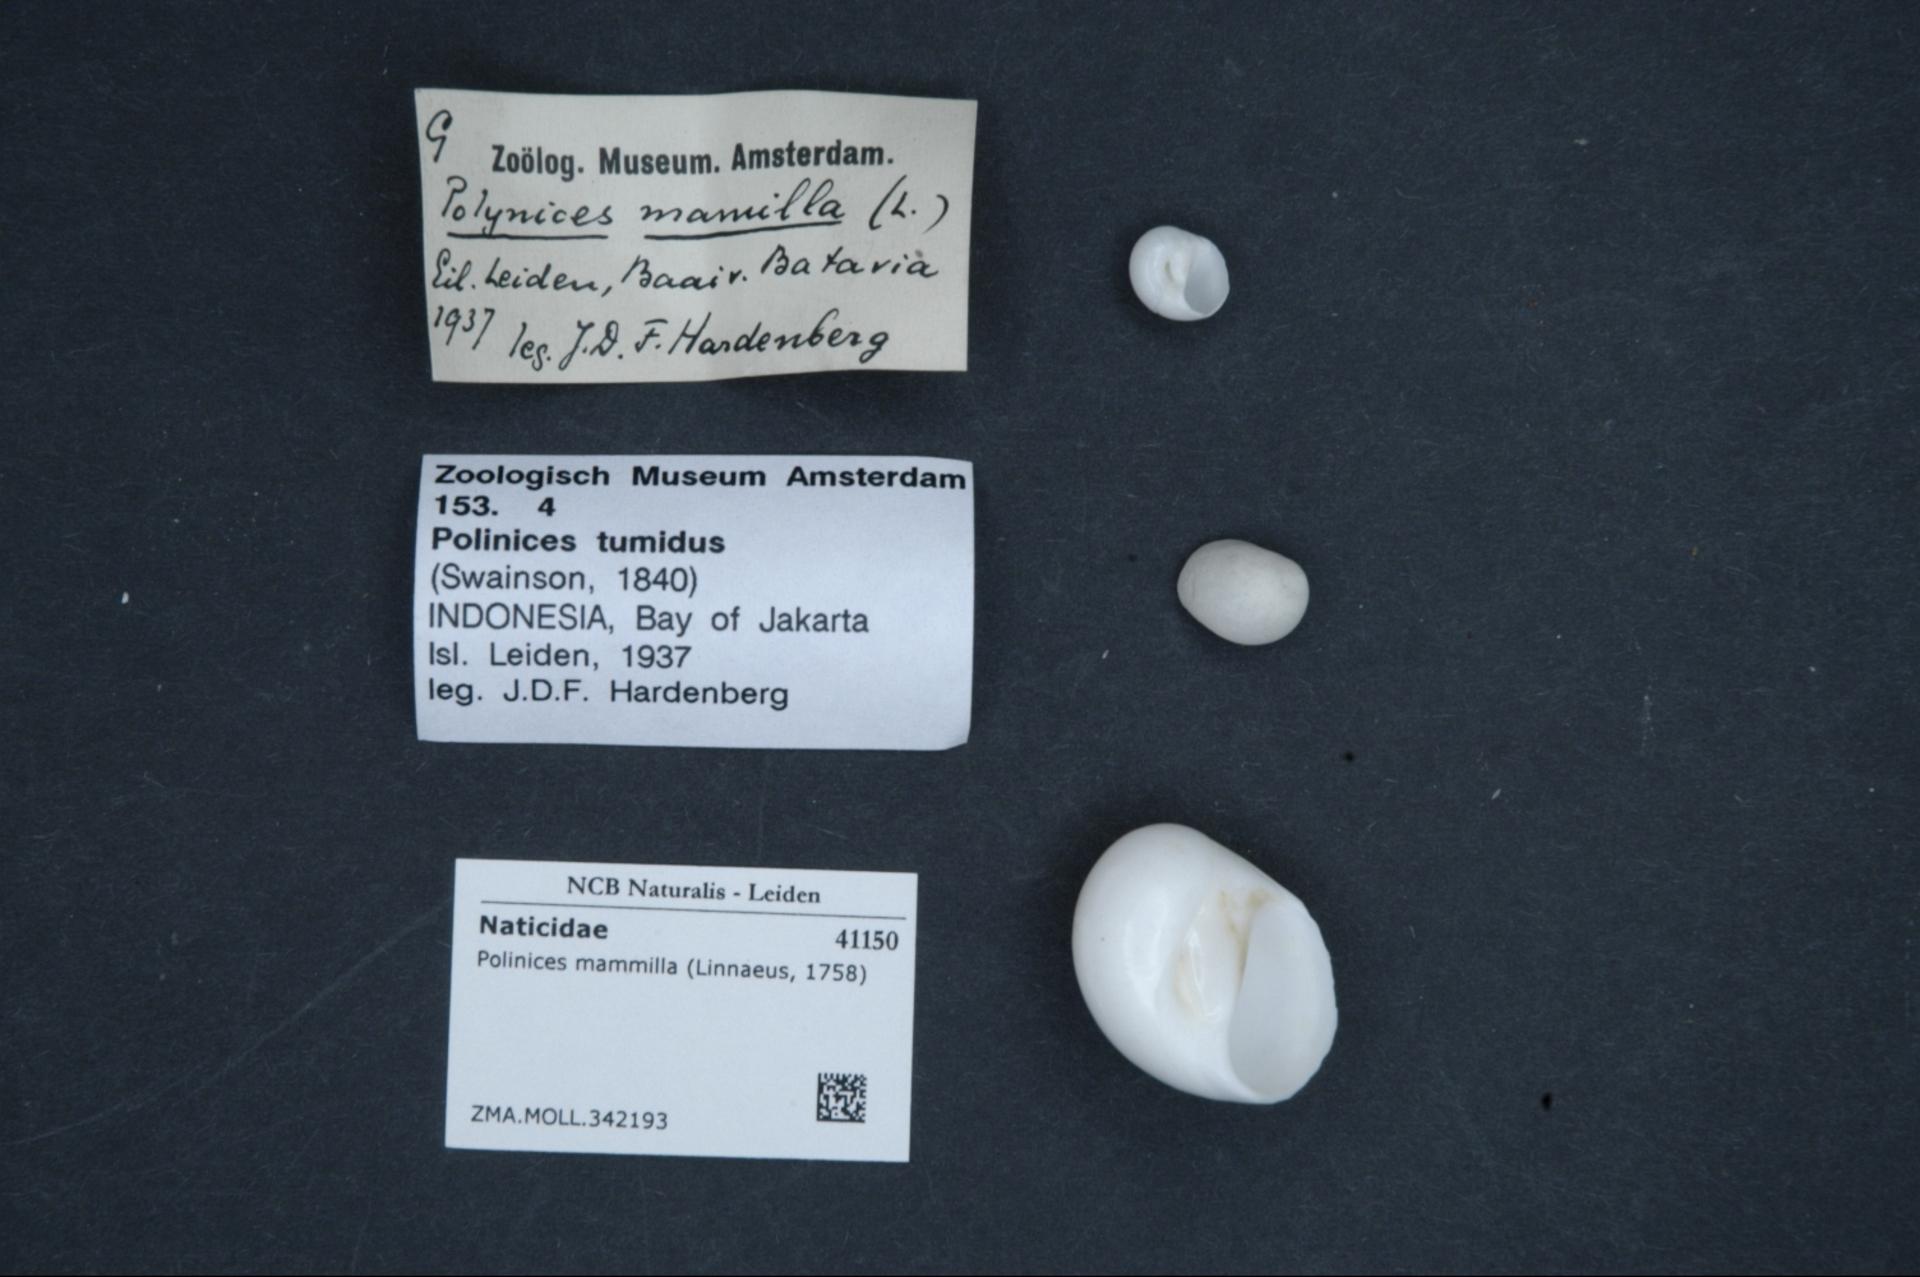 ZMA.MOLL.342193 | Polinices mammilla (Linnaeus, 1758)